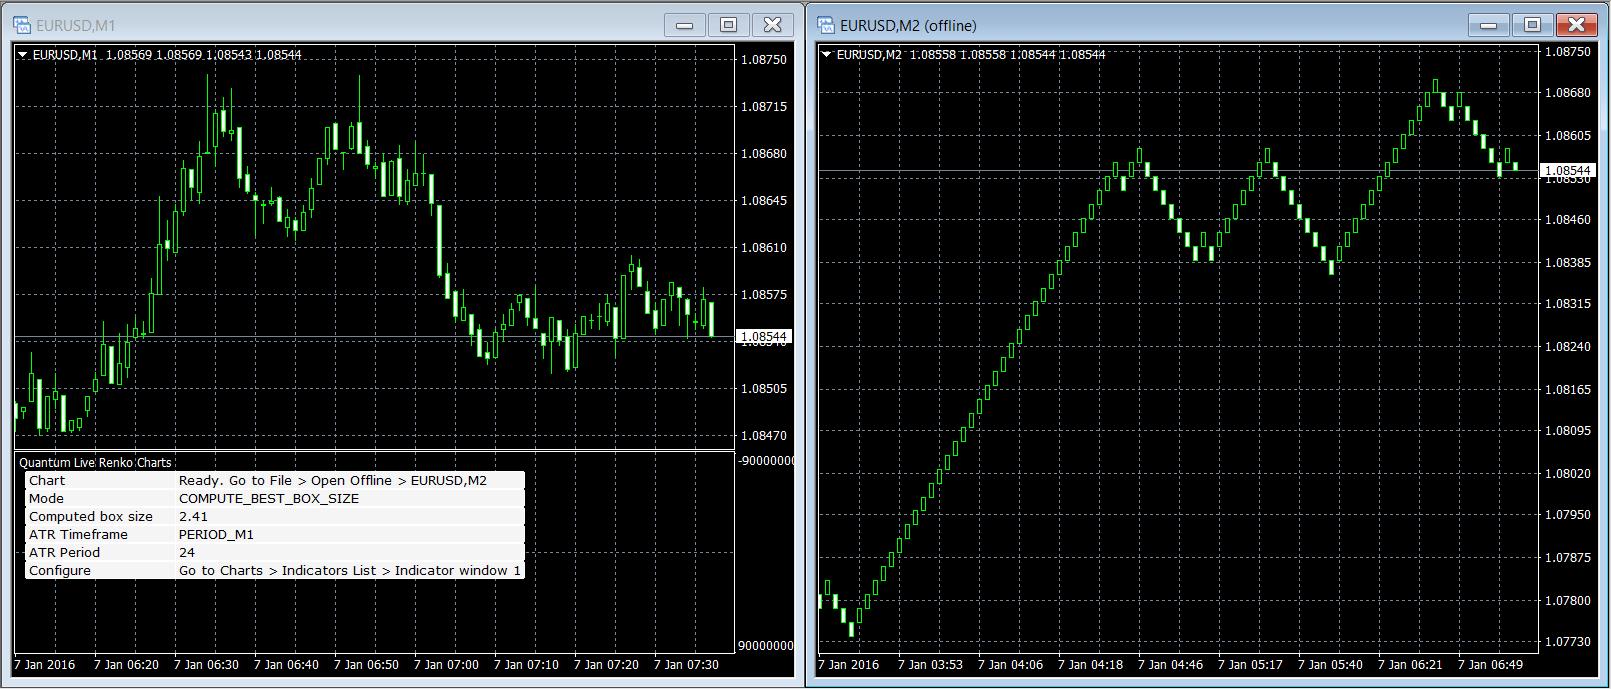 Balance of market power mt4